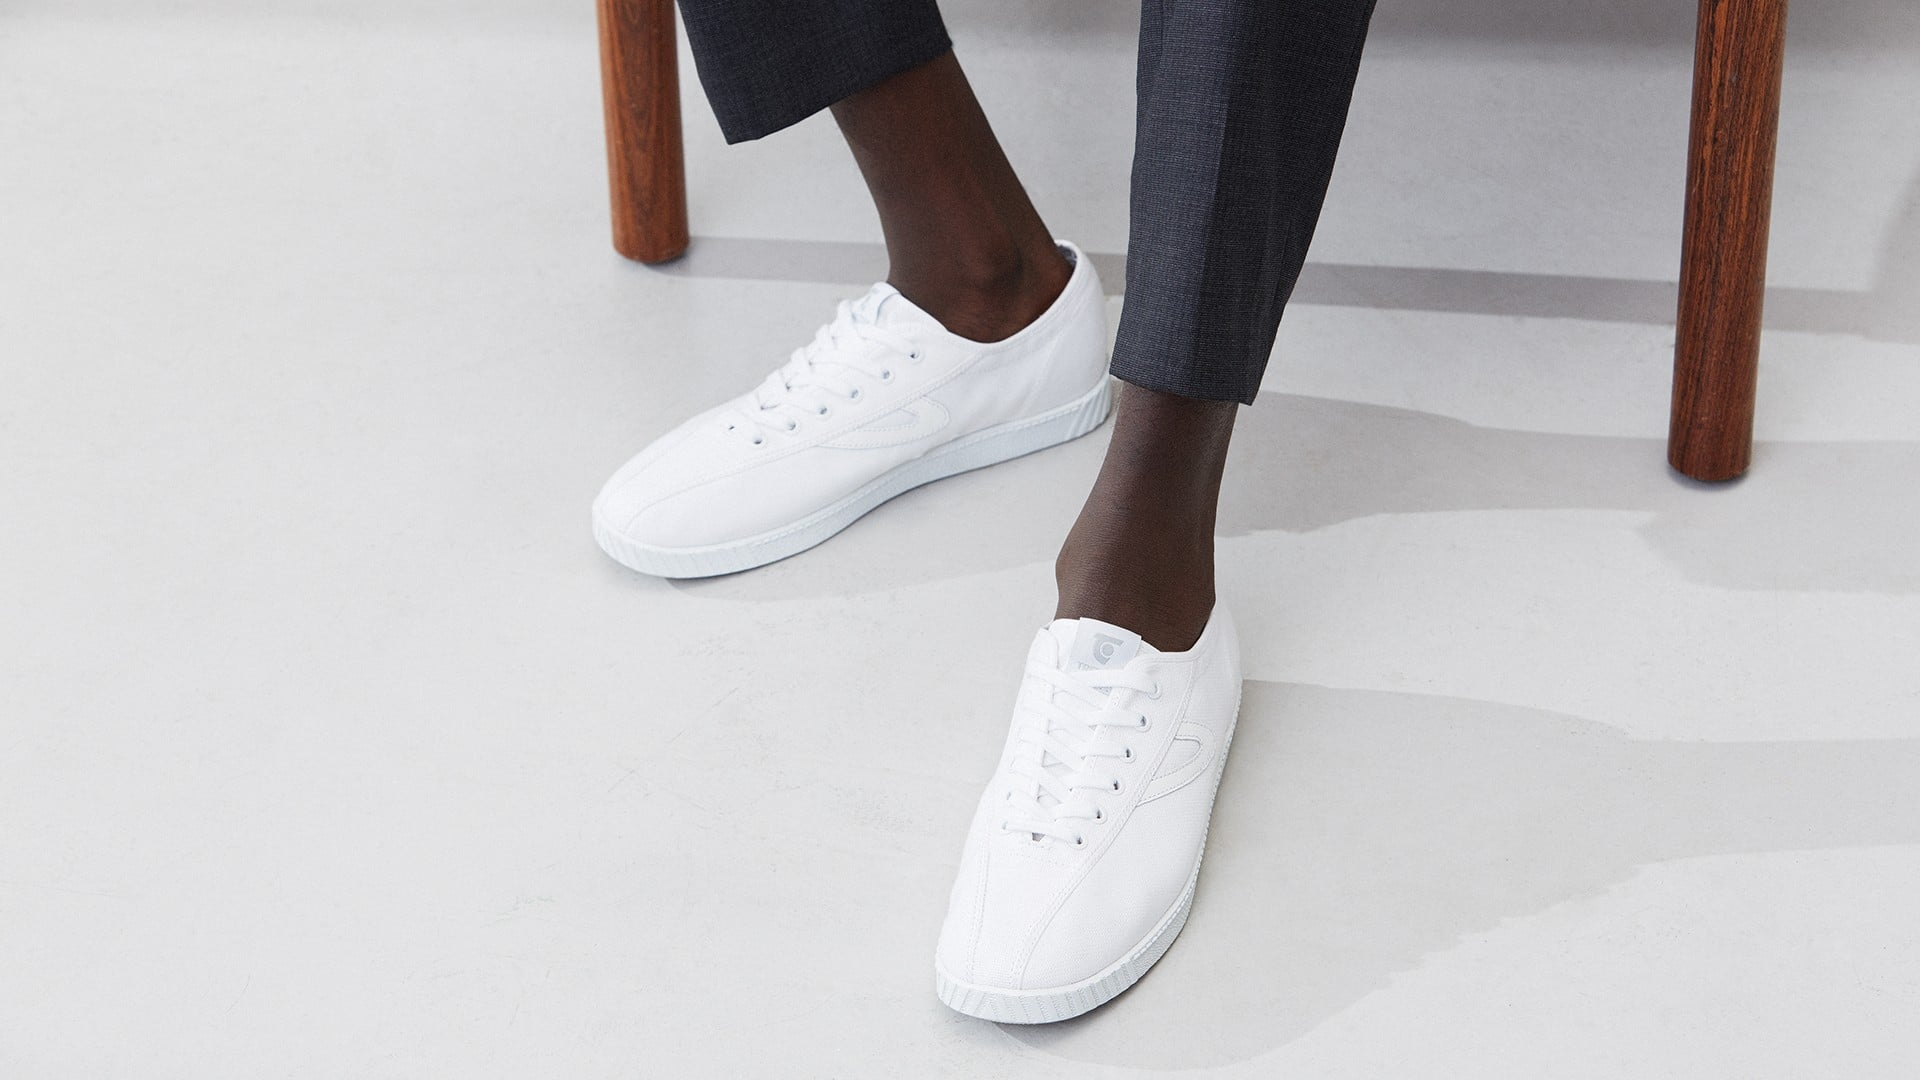 Tretorn sustainable shoes